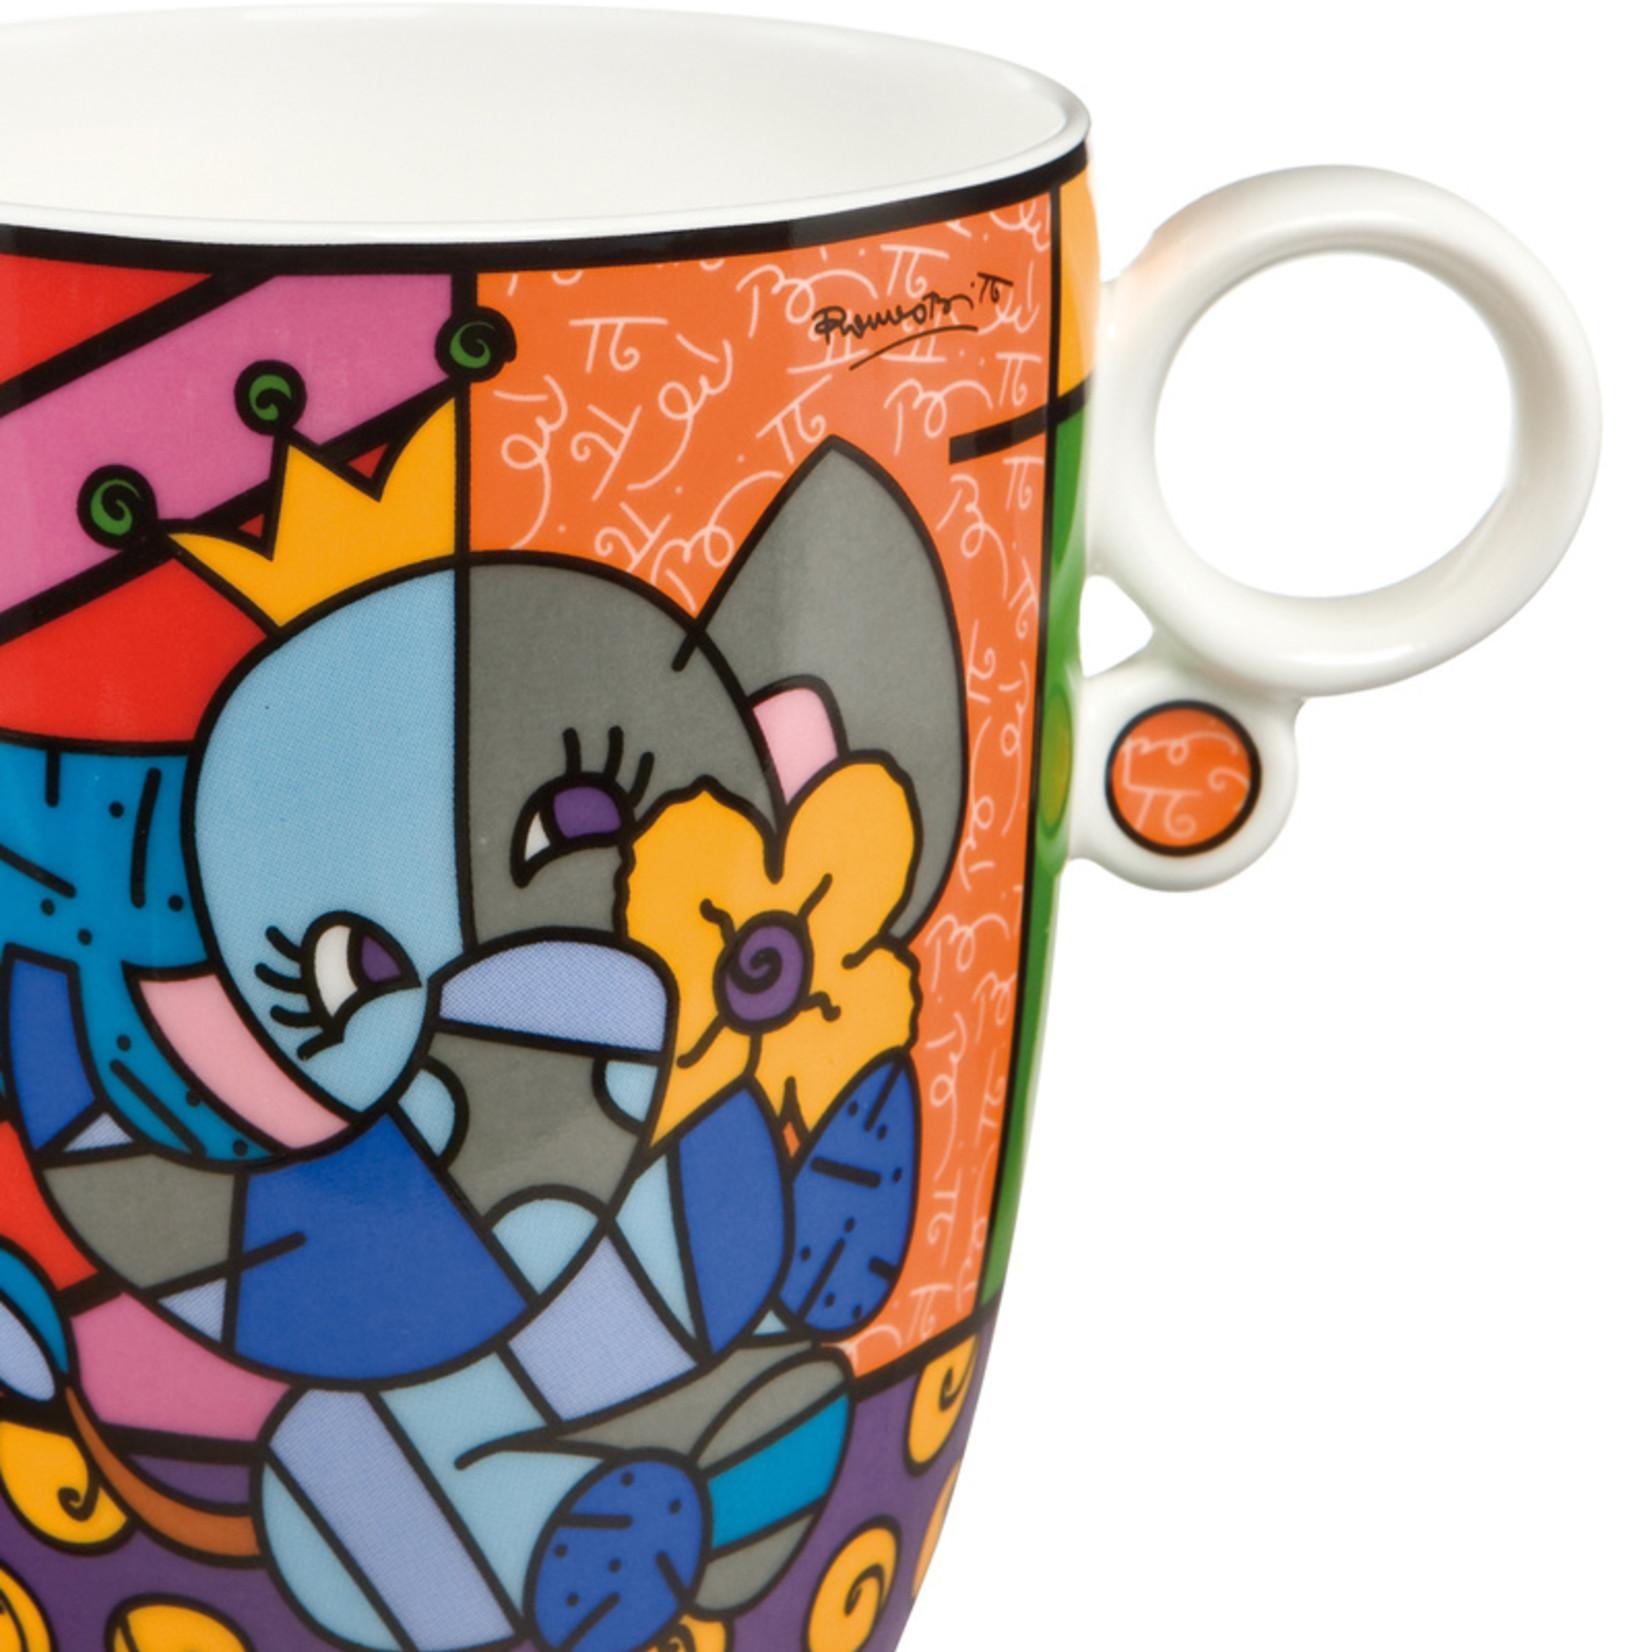 Goebel Porzellanmanufaktur Kaffeebecher Spring Elephant | Romero Britto | Goebel Porzellan